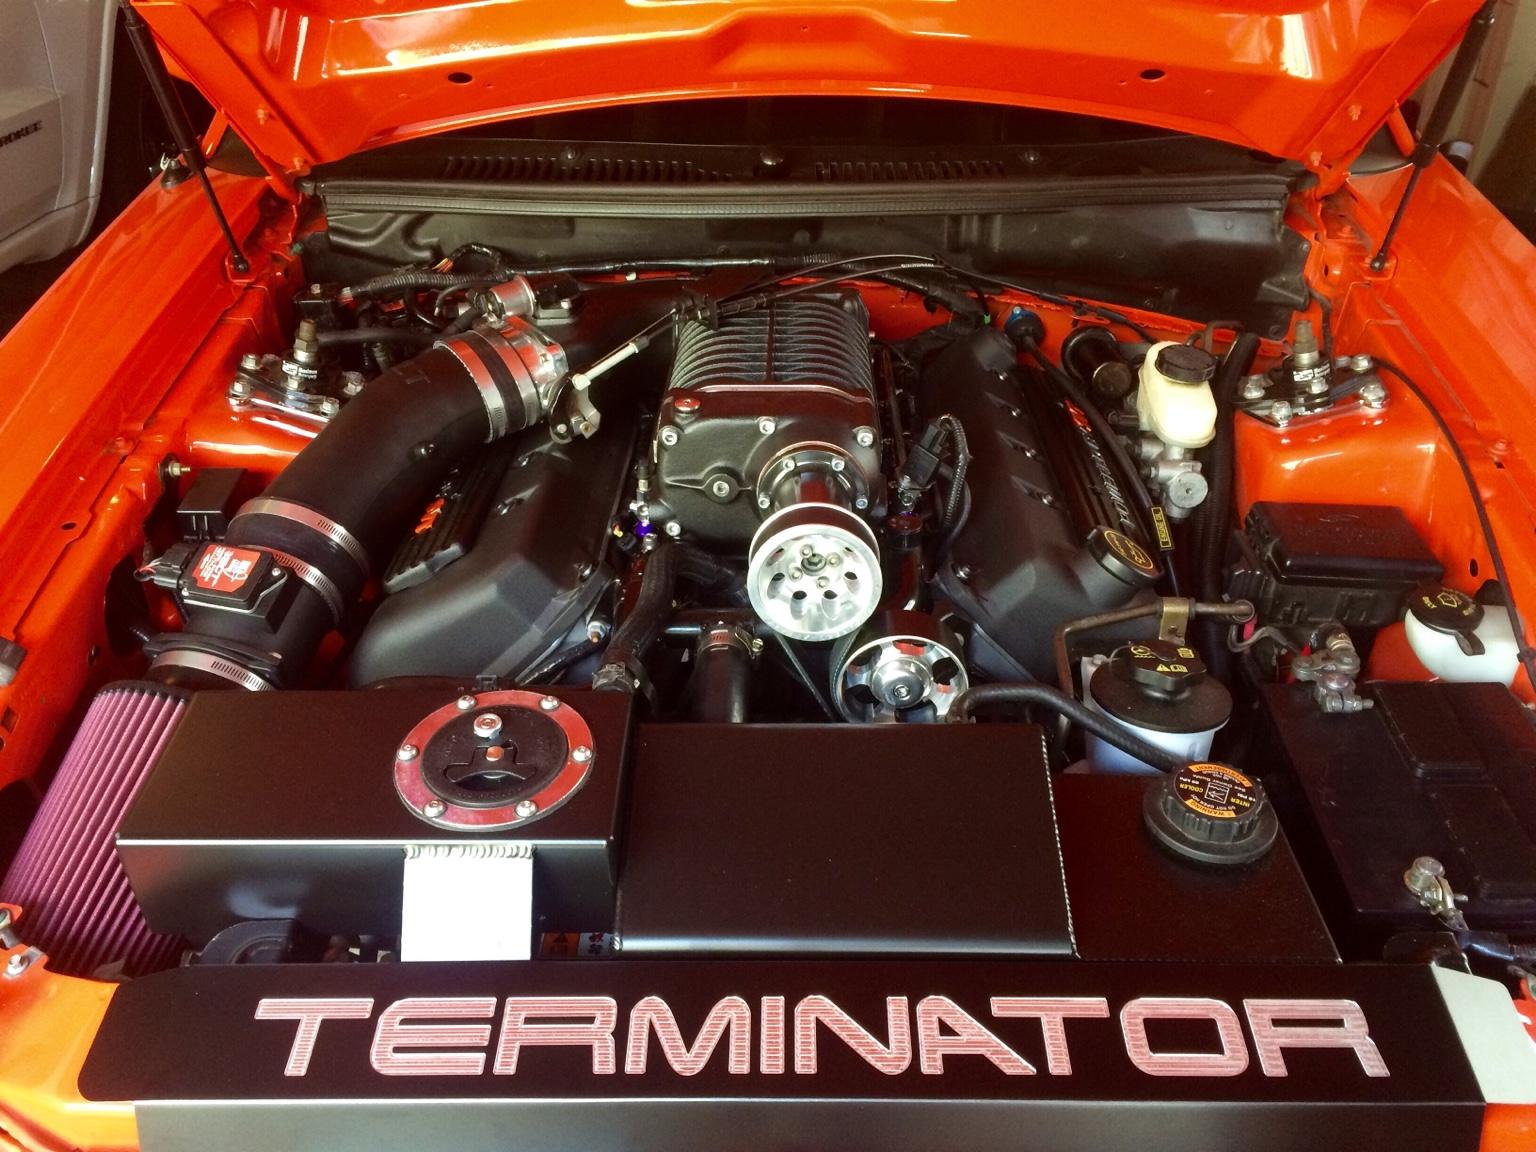 Terminator Cobra Engine Bay